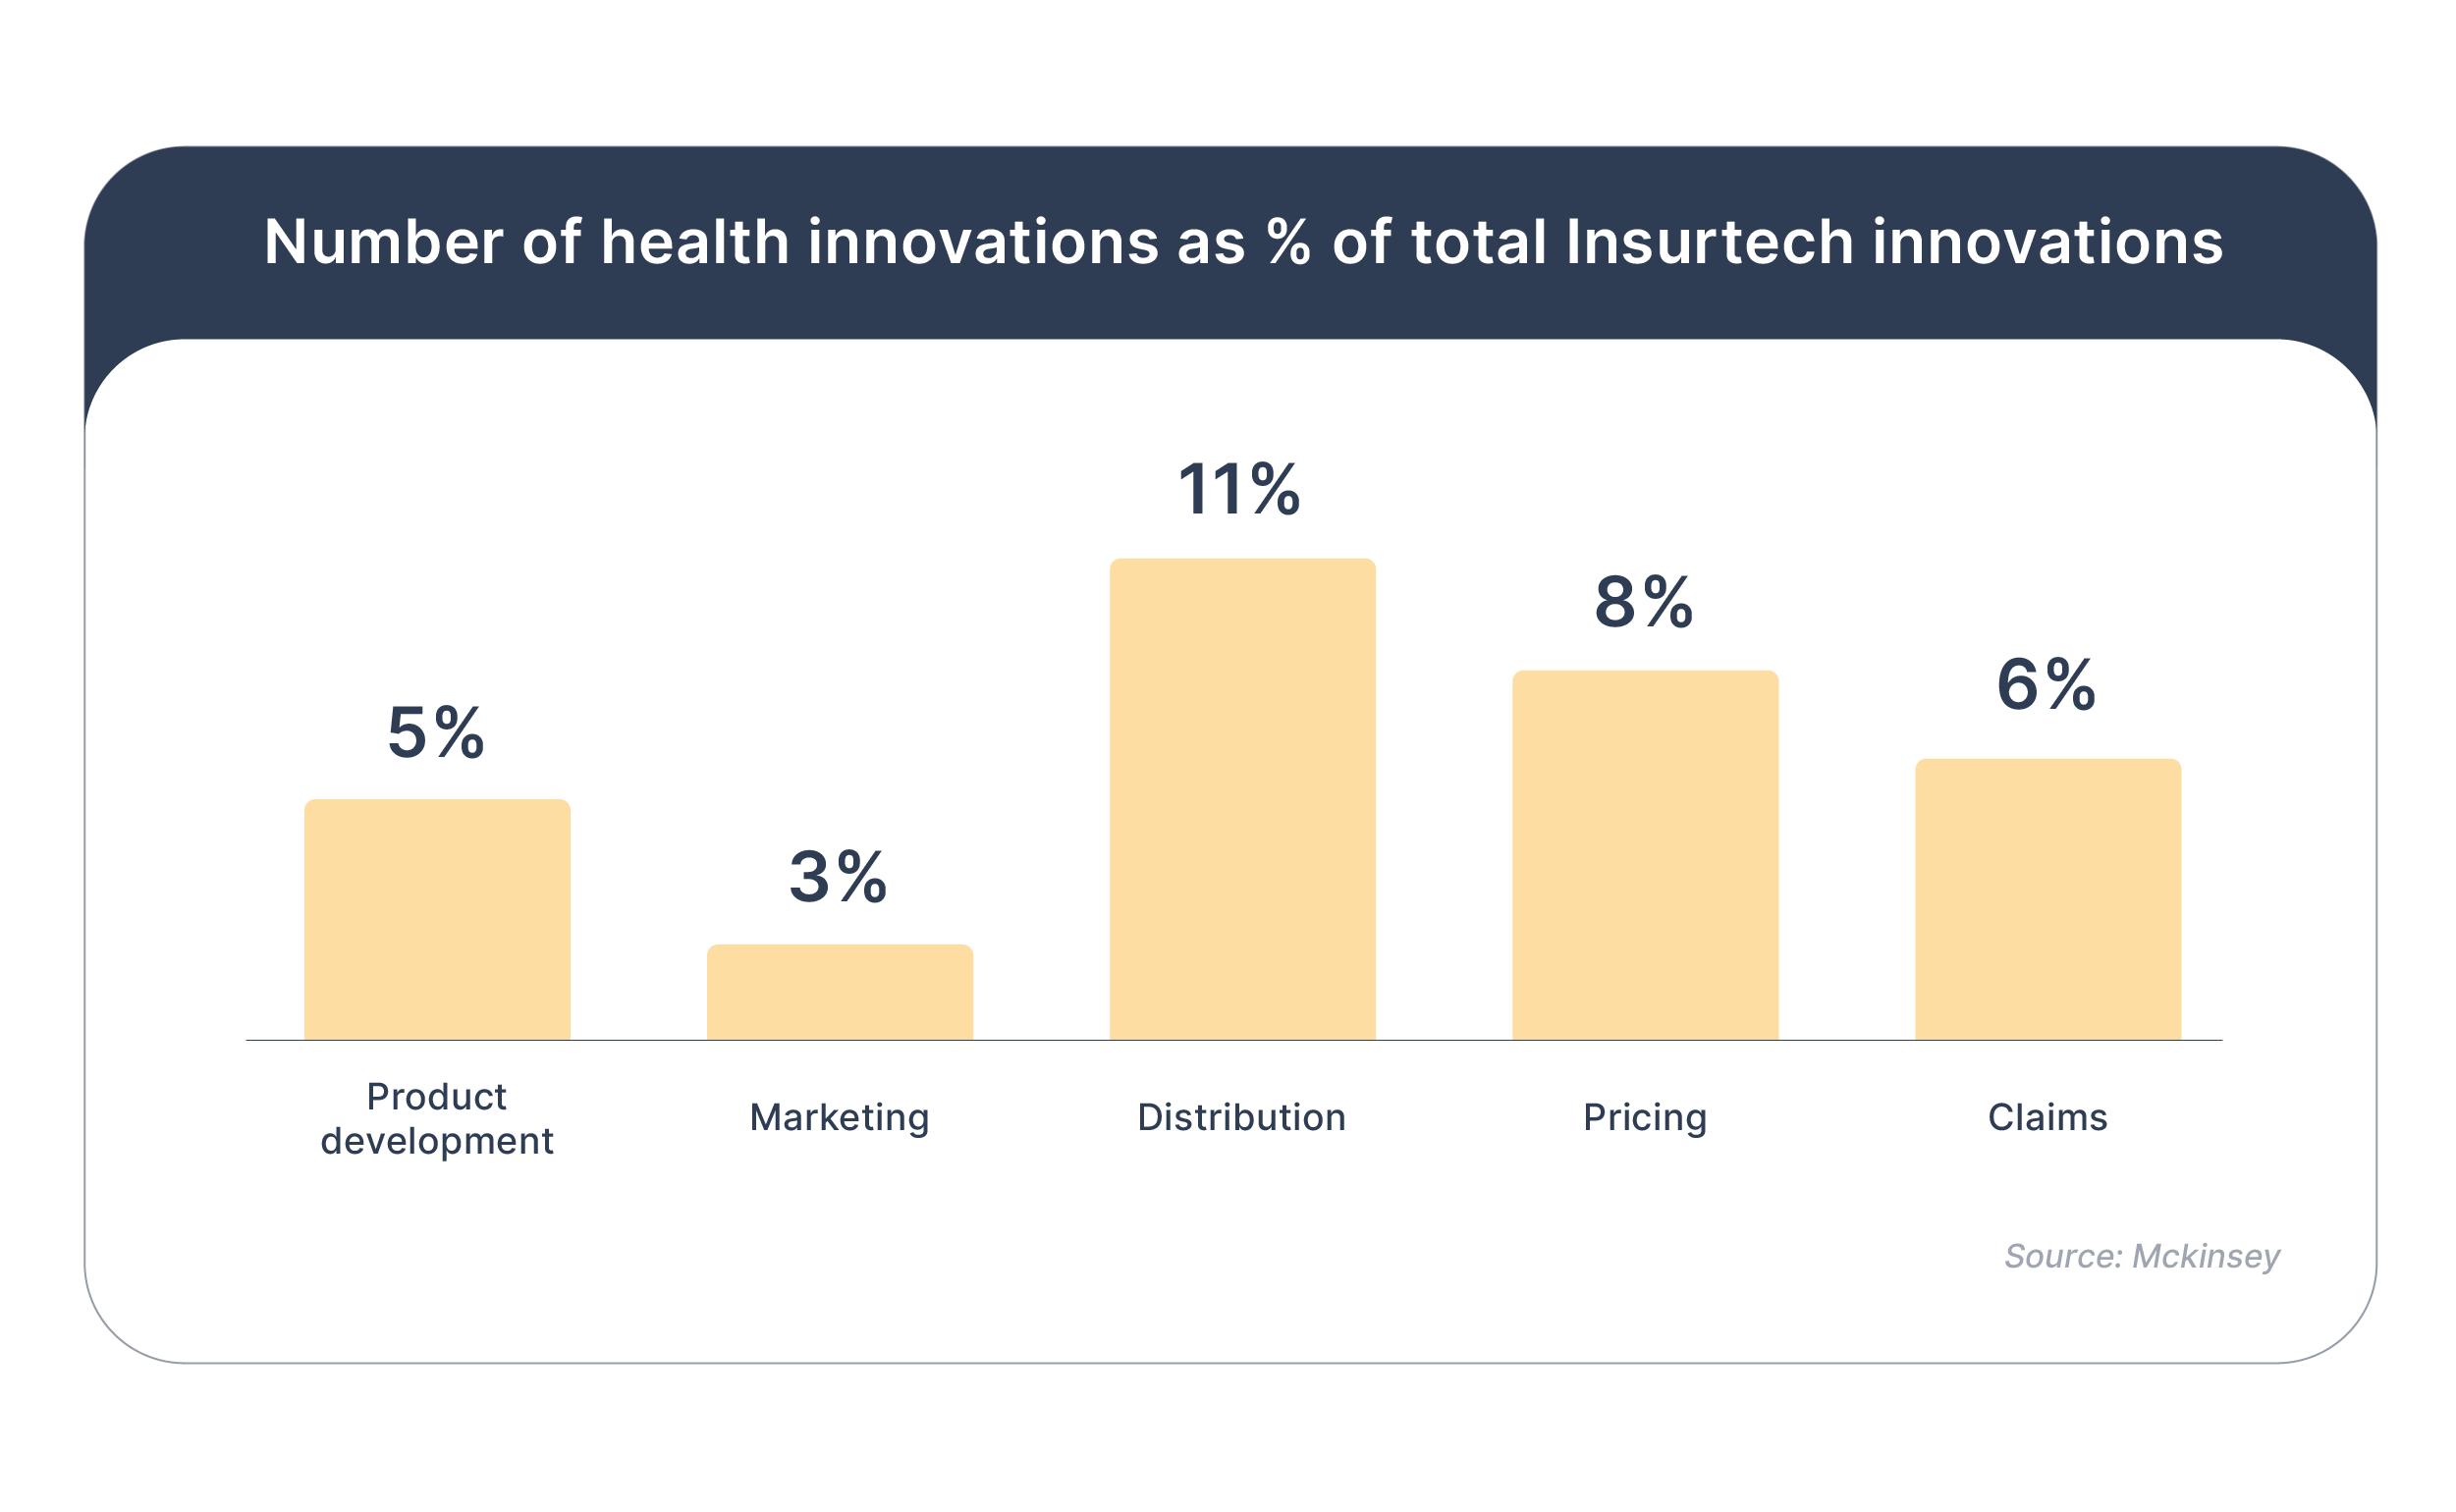 Heath insurtech innovations stats